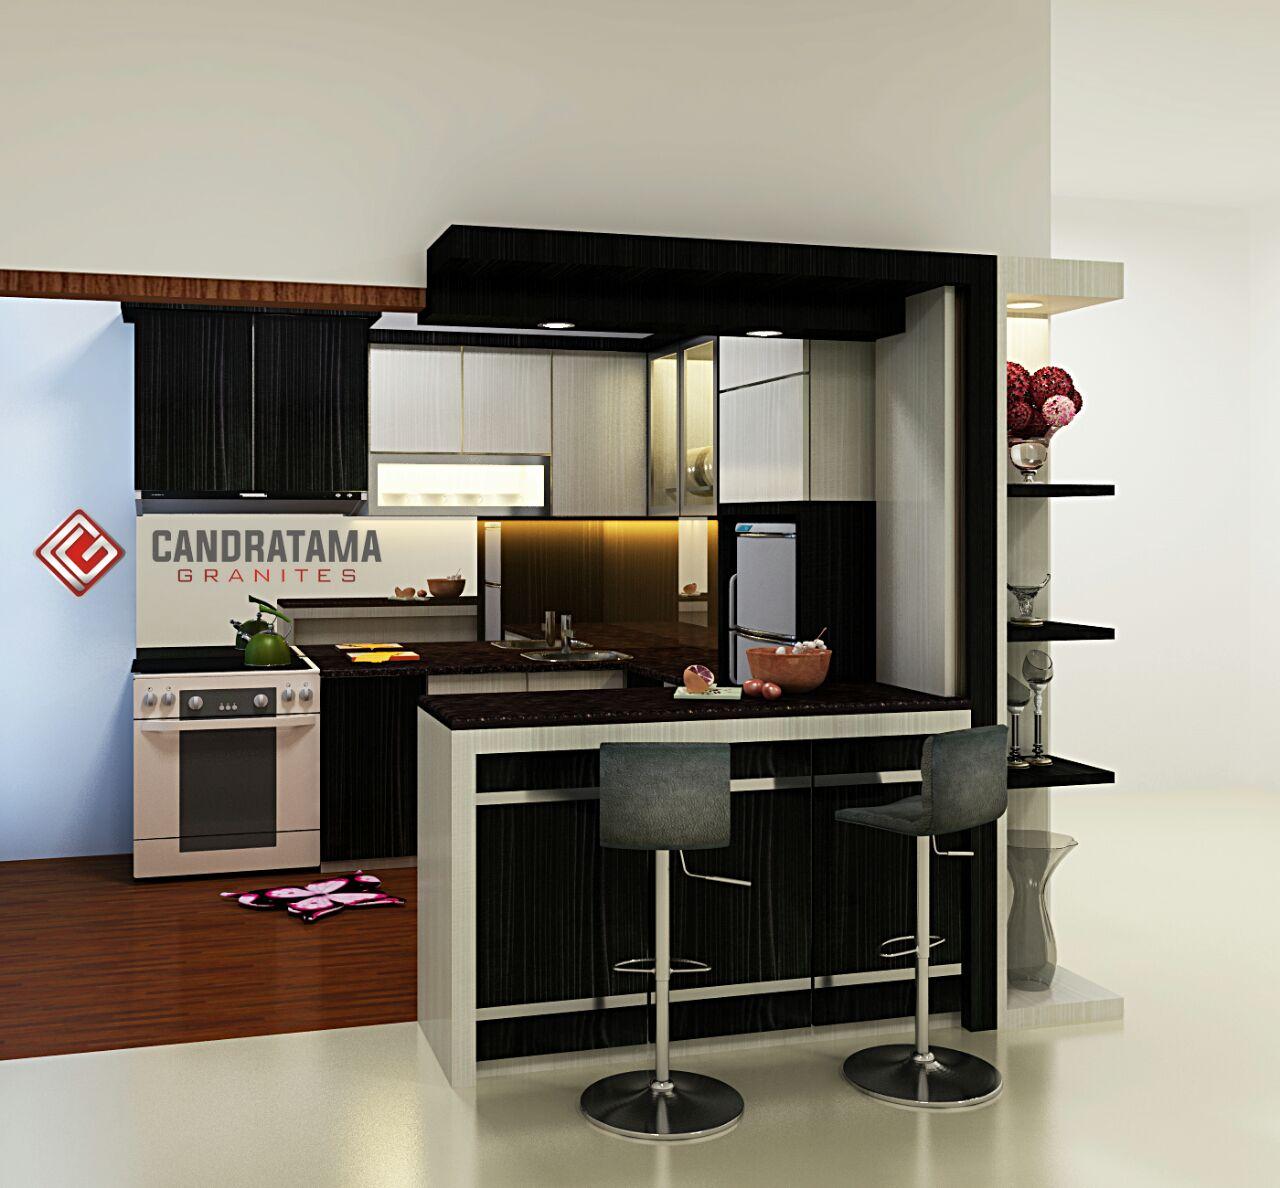 Kitchen Set Surabaya: Jasa Desain Interior Malang Nganjuk